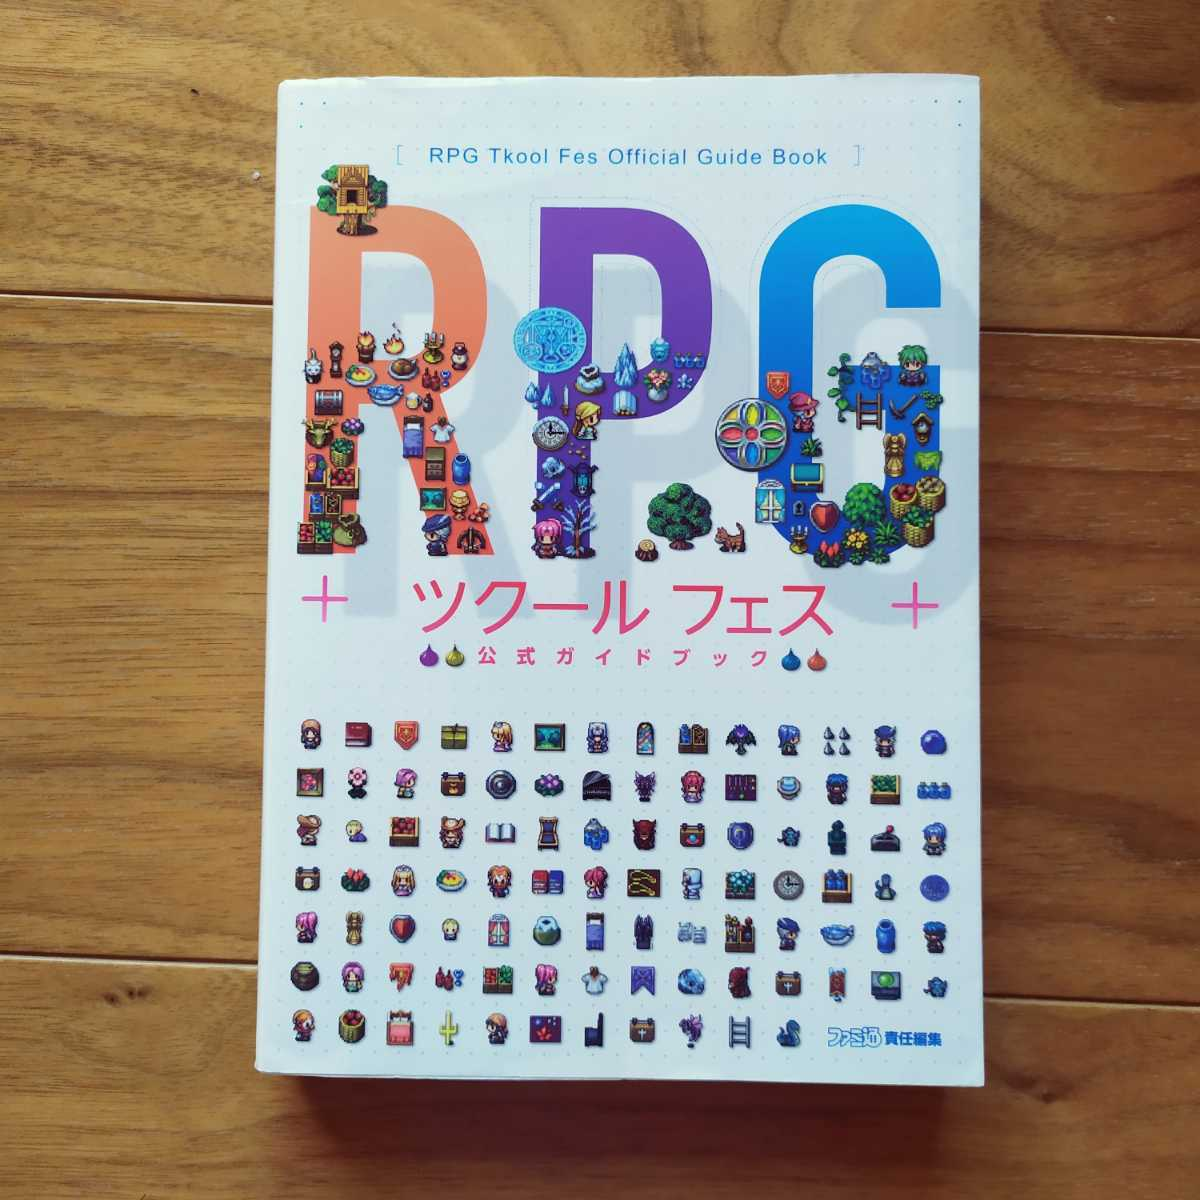 RPGツクールフェス 公式ガイドブック